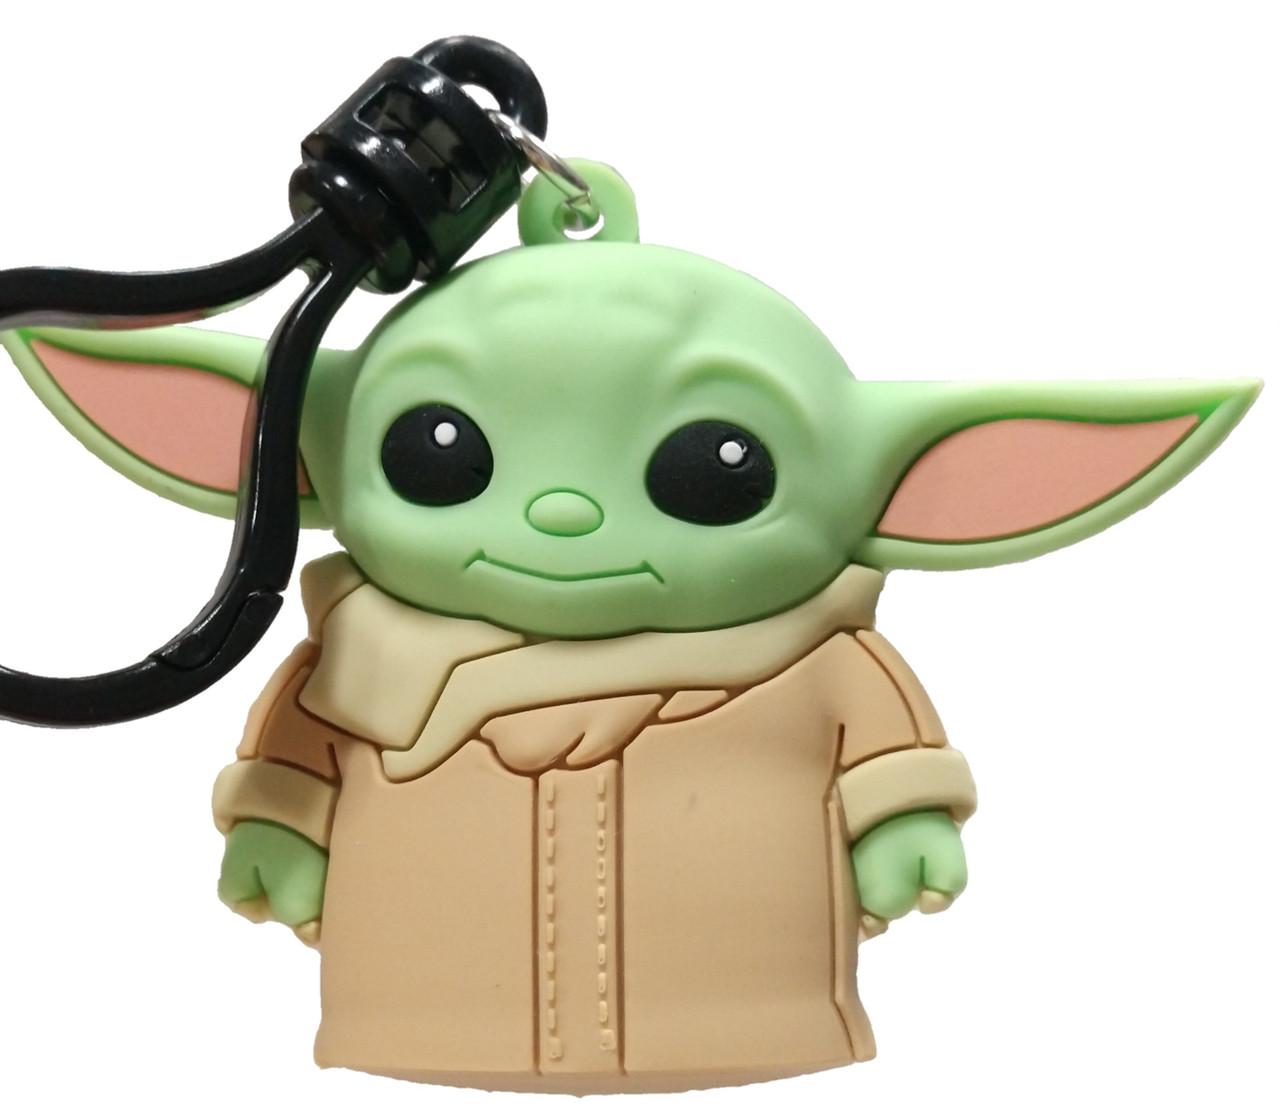 SDCC 2020 Monogram Exclusive Mandalorian Star Wars Bag Clips Baby Yoda CONFIRMED